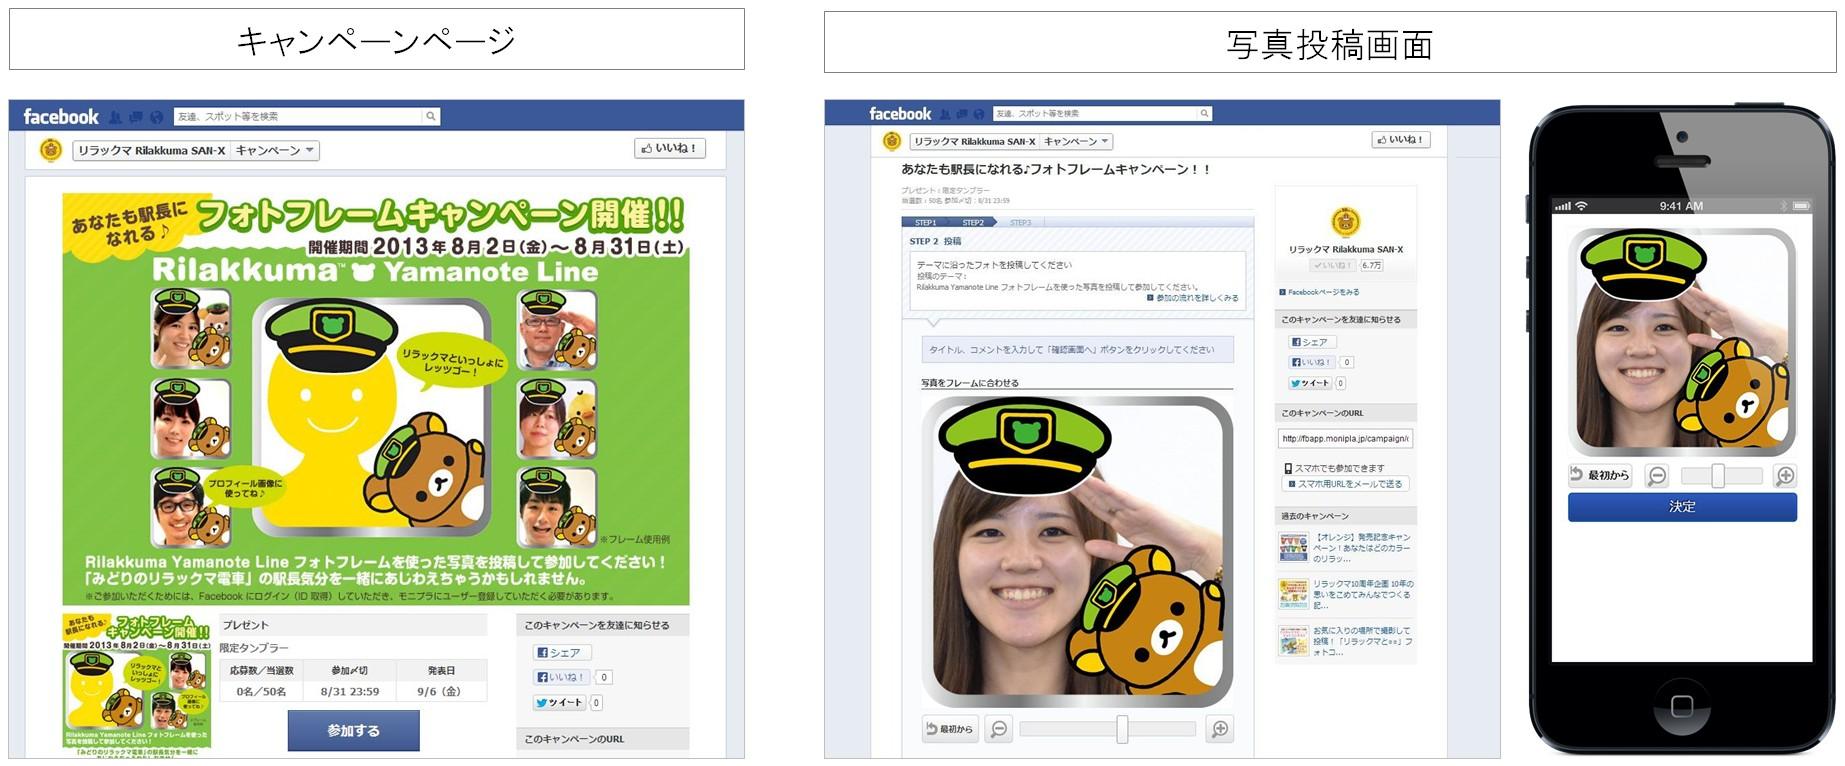 rilakkuma_cp_image.jpg